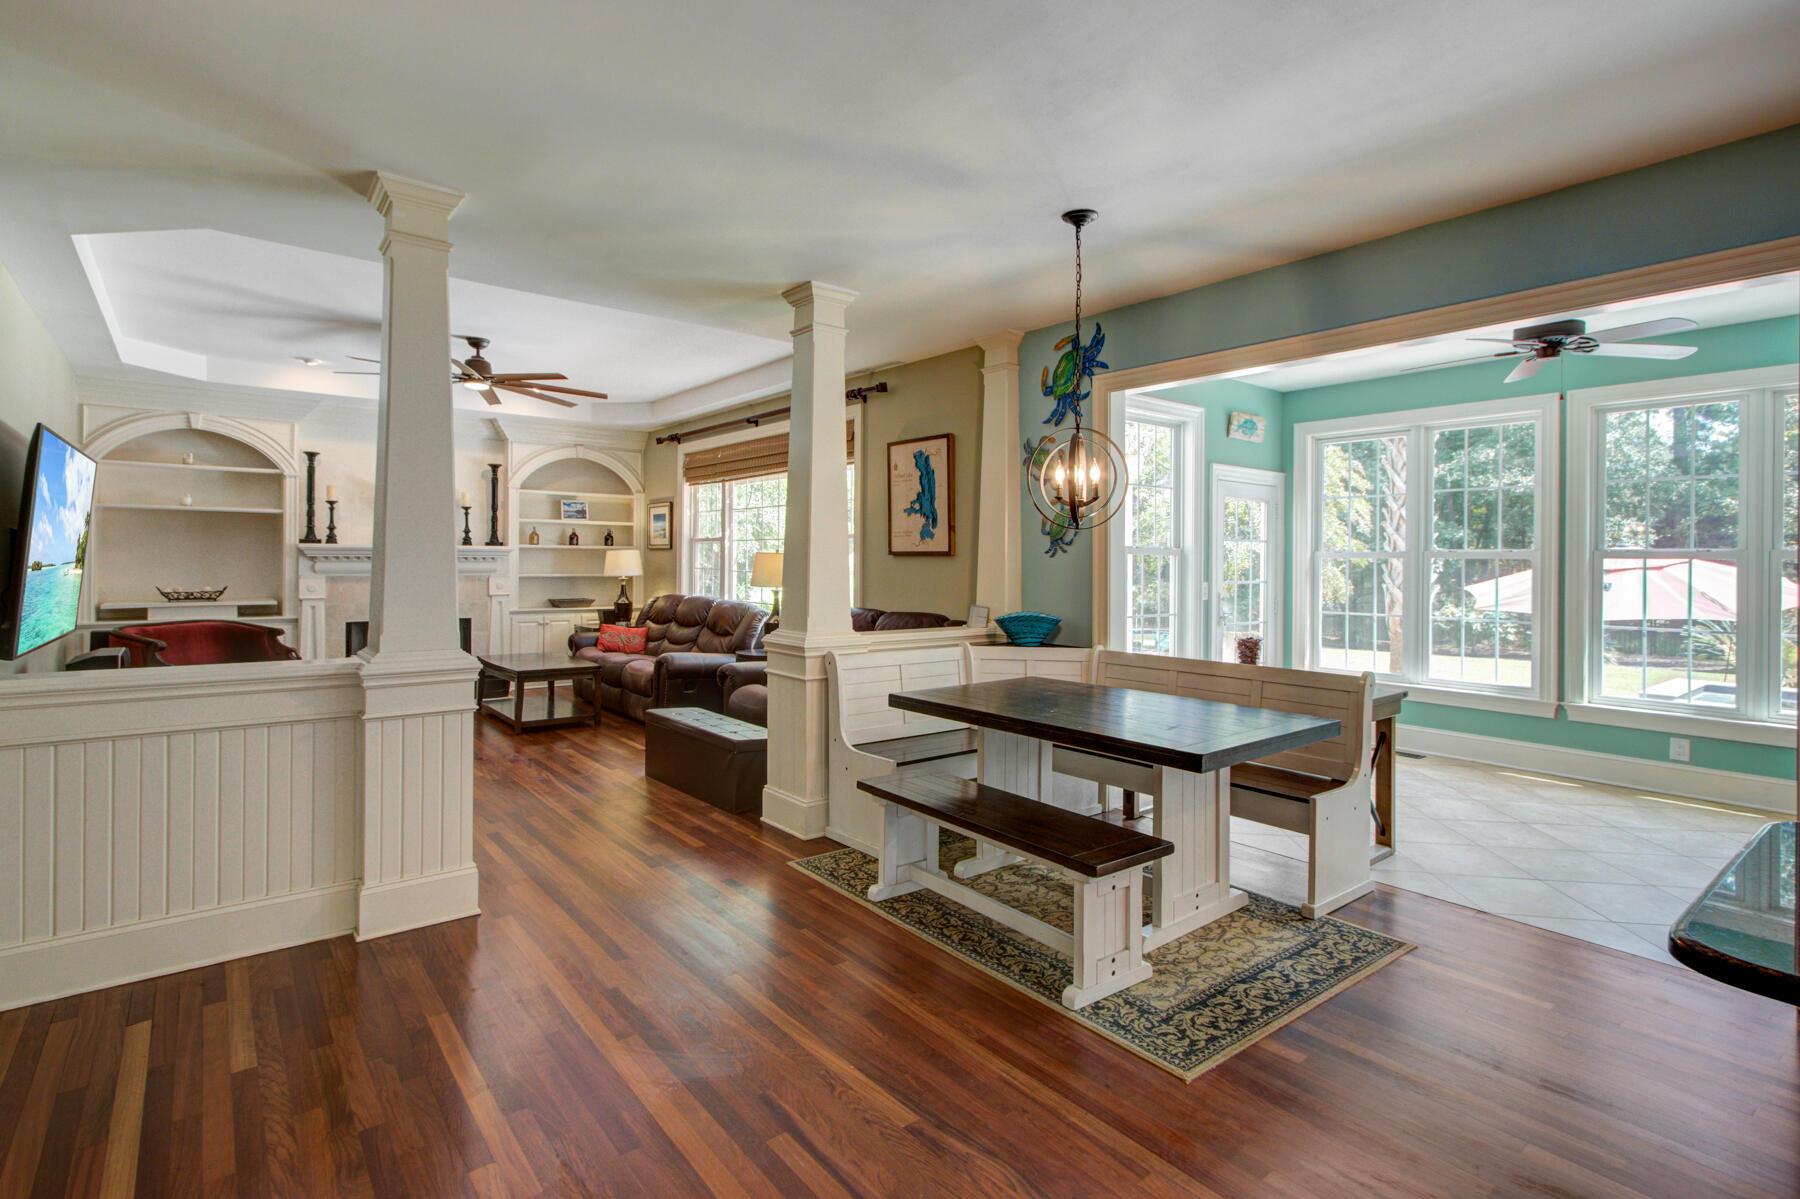 Dunes West Homes For Sale - 3095 Pignatelli, Mount Pleasant, SC - 16